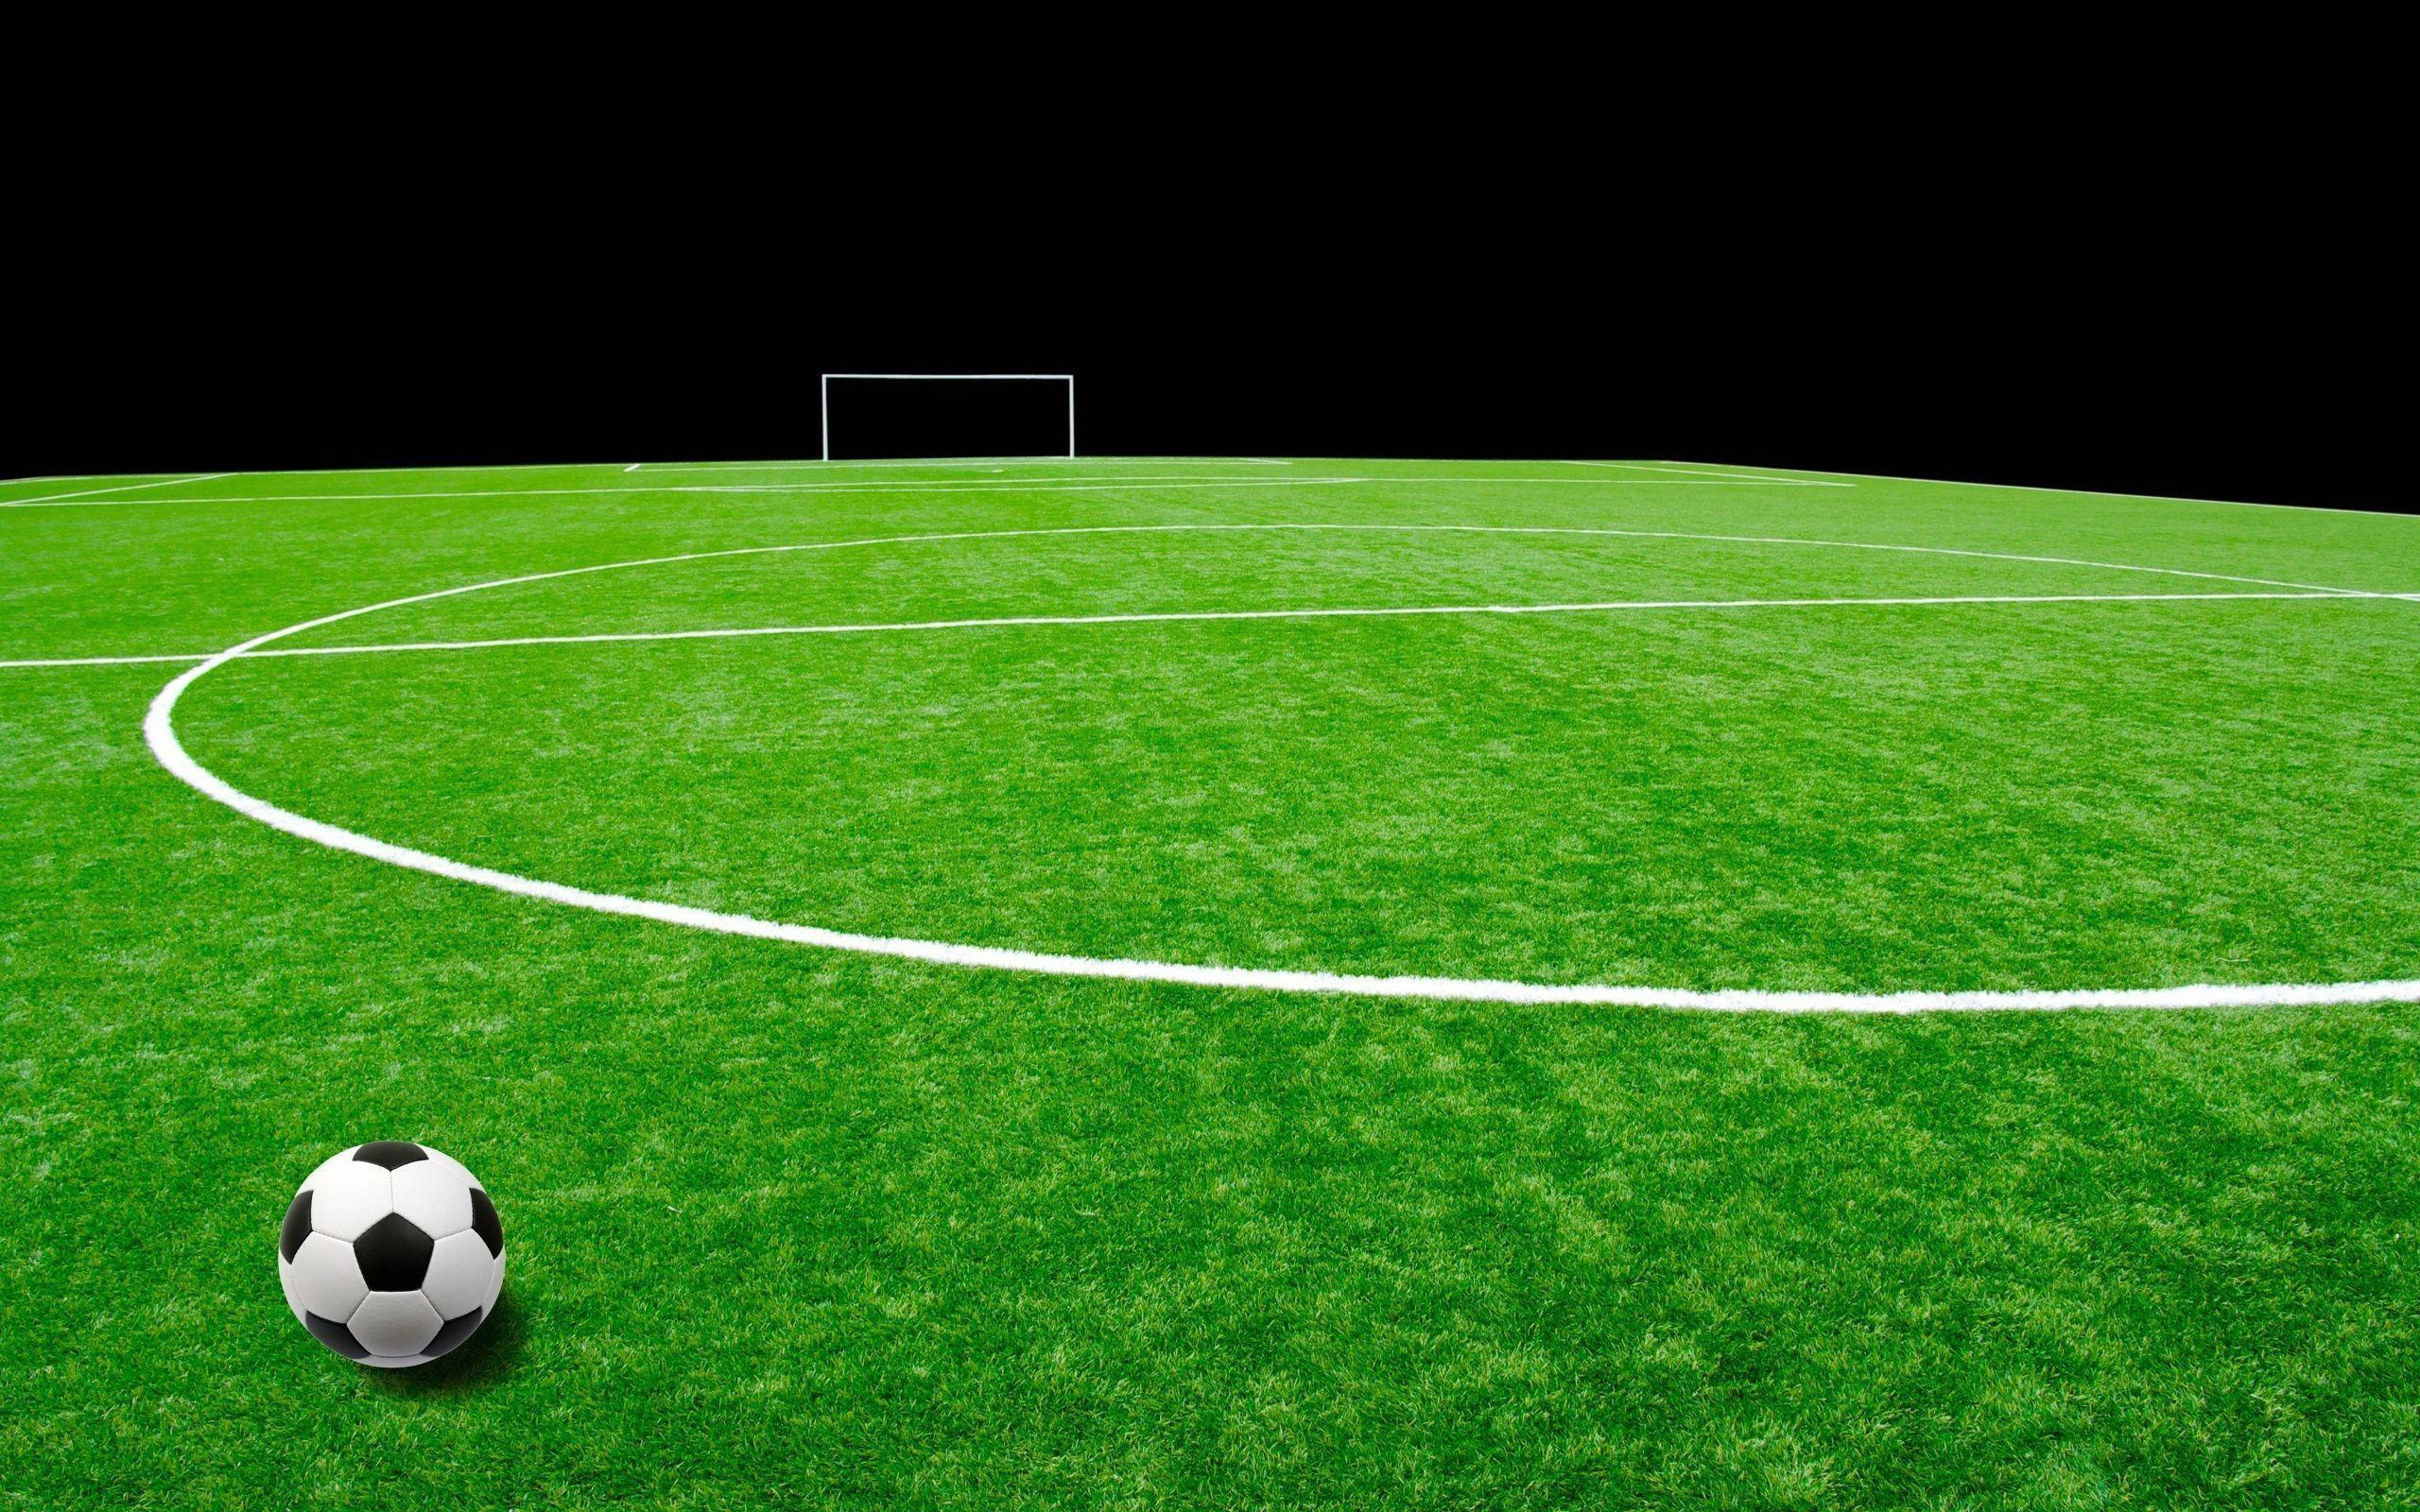 Football Wallpaper Amazon Co Uk: Wallpaper Football Ground